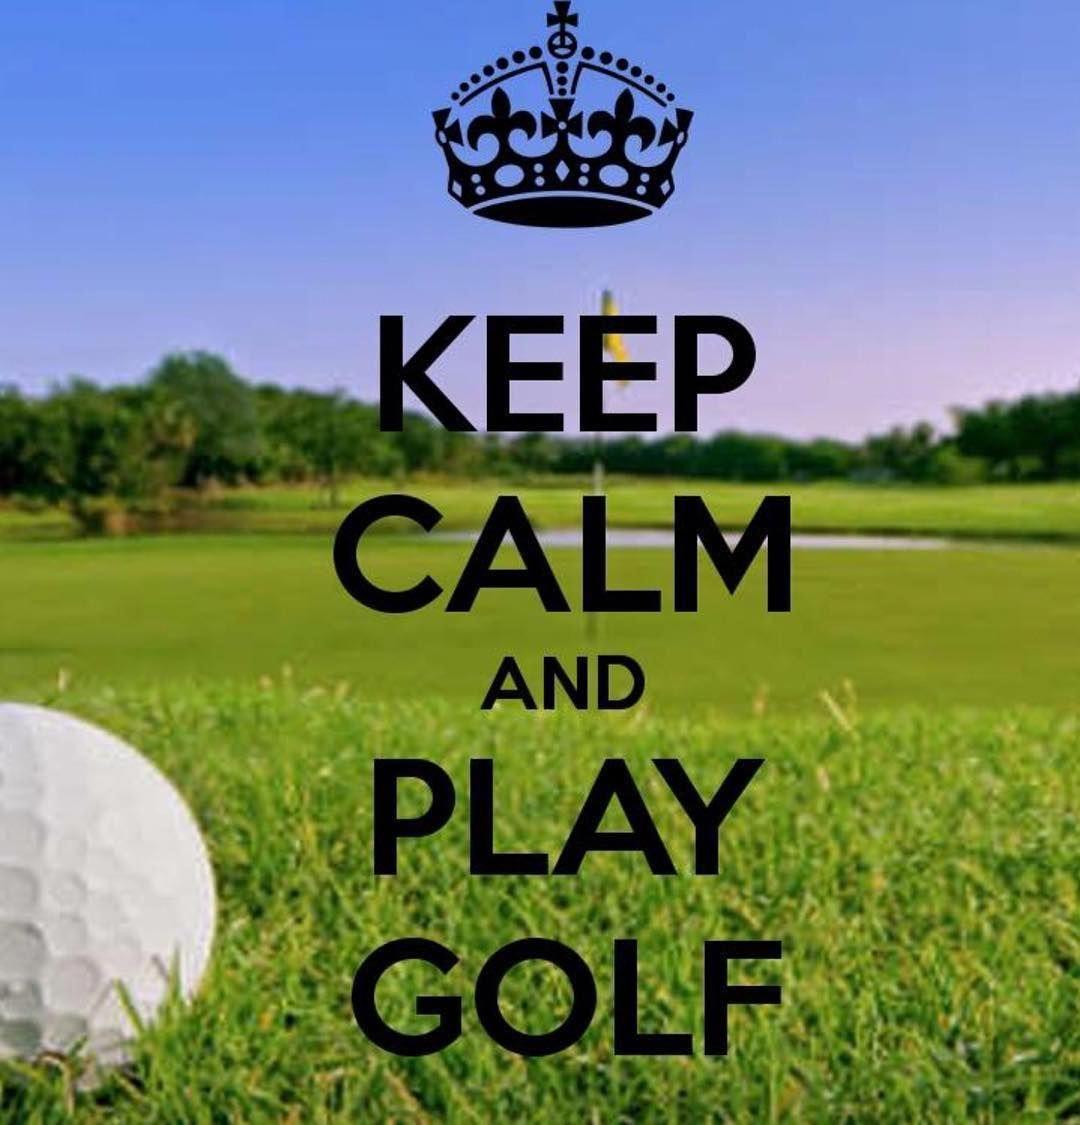 Keep calm and play golf golfer igolf iplaygolf